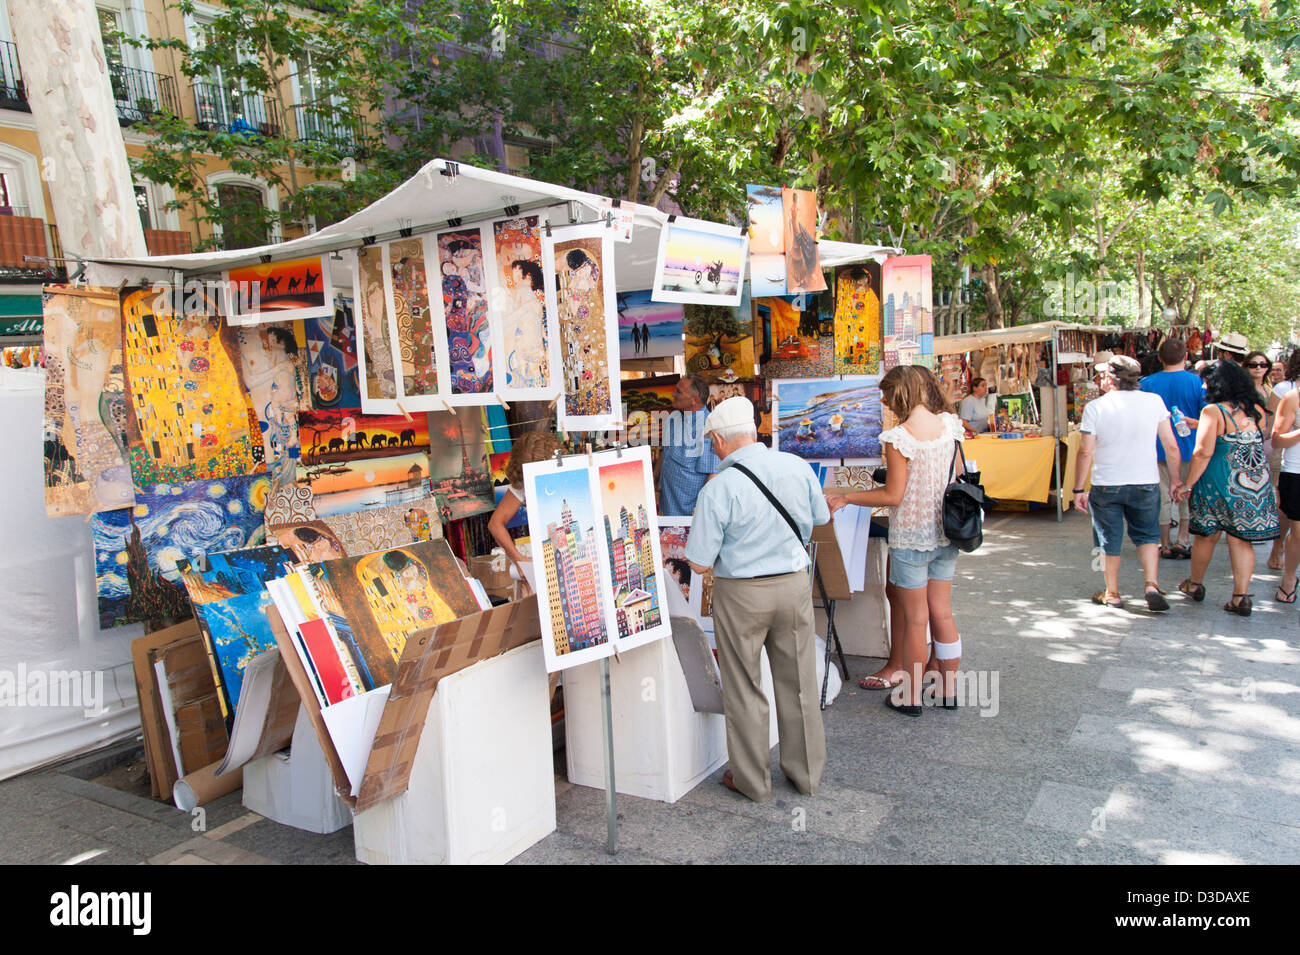 Rastro market stall selling art prints la latina madrid for Sell art prints online